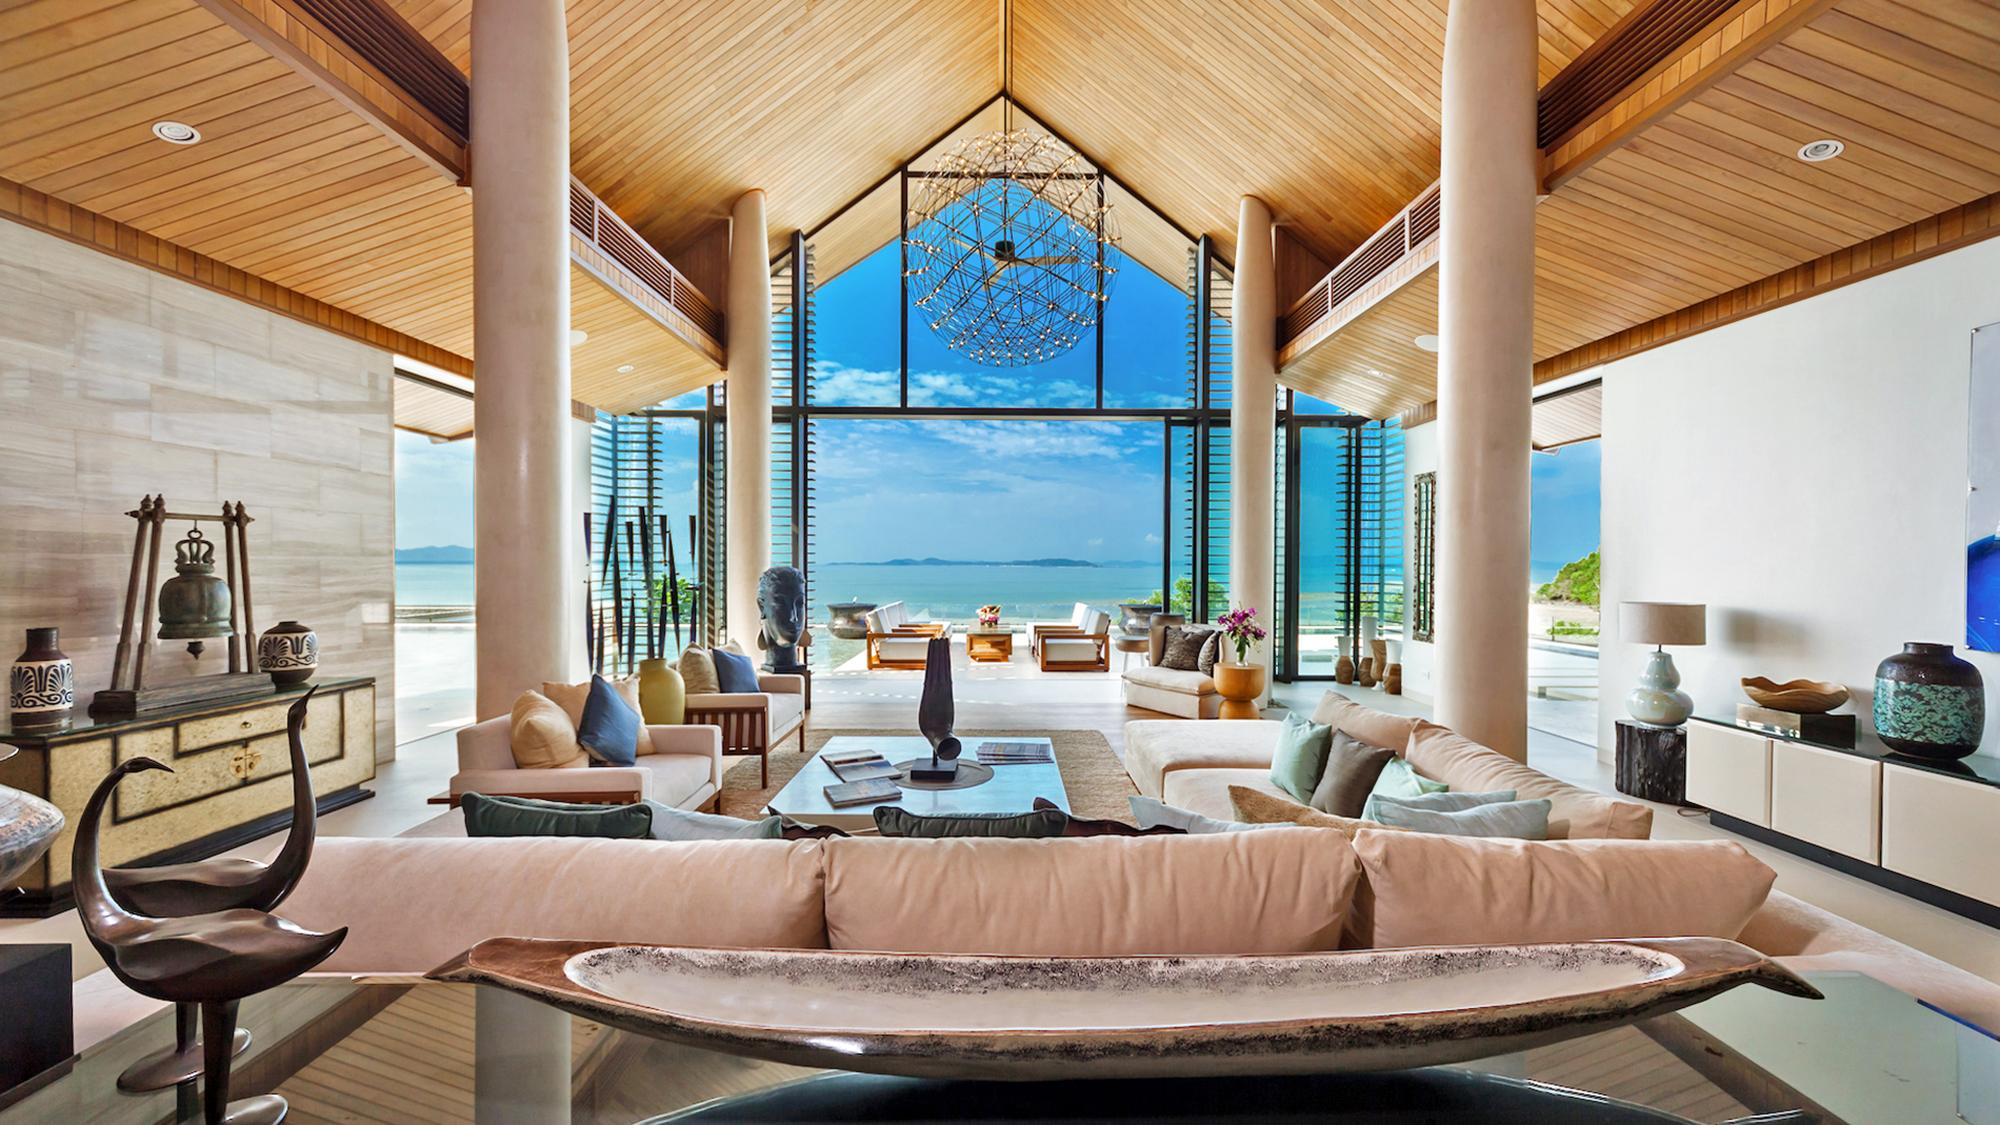 Luxury Retreats Blurring The Lines Travel Weekly